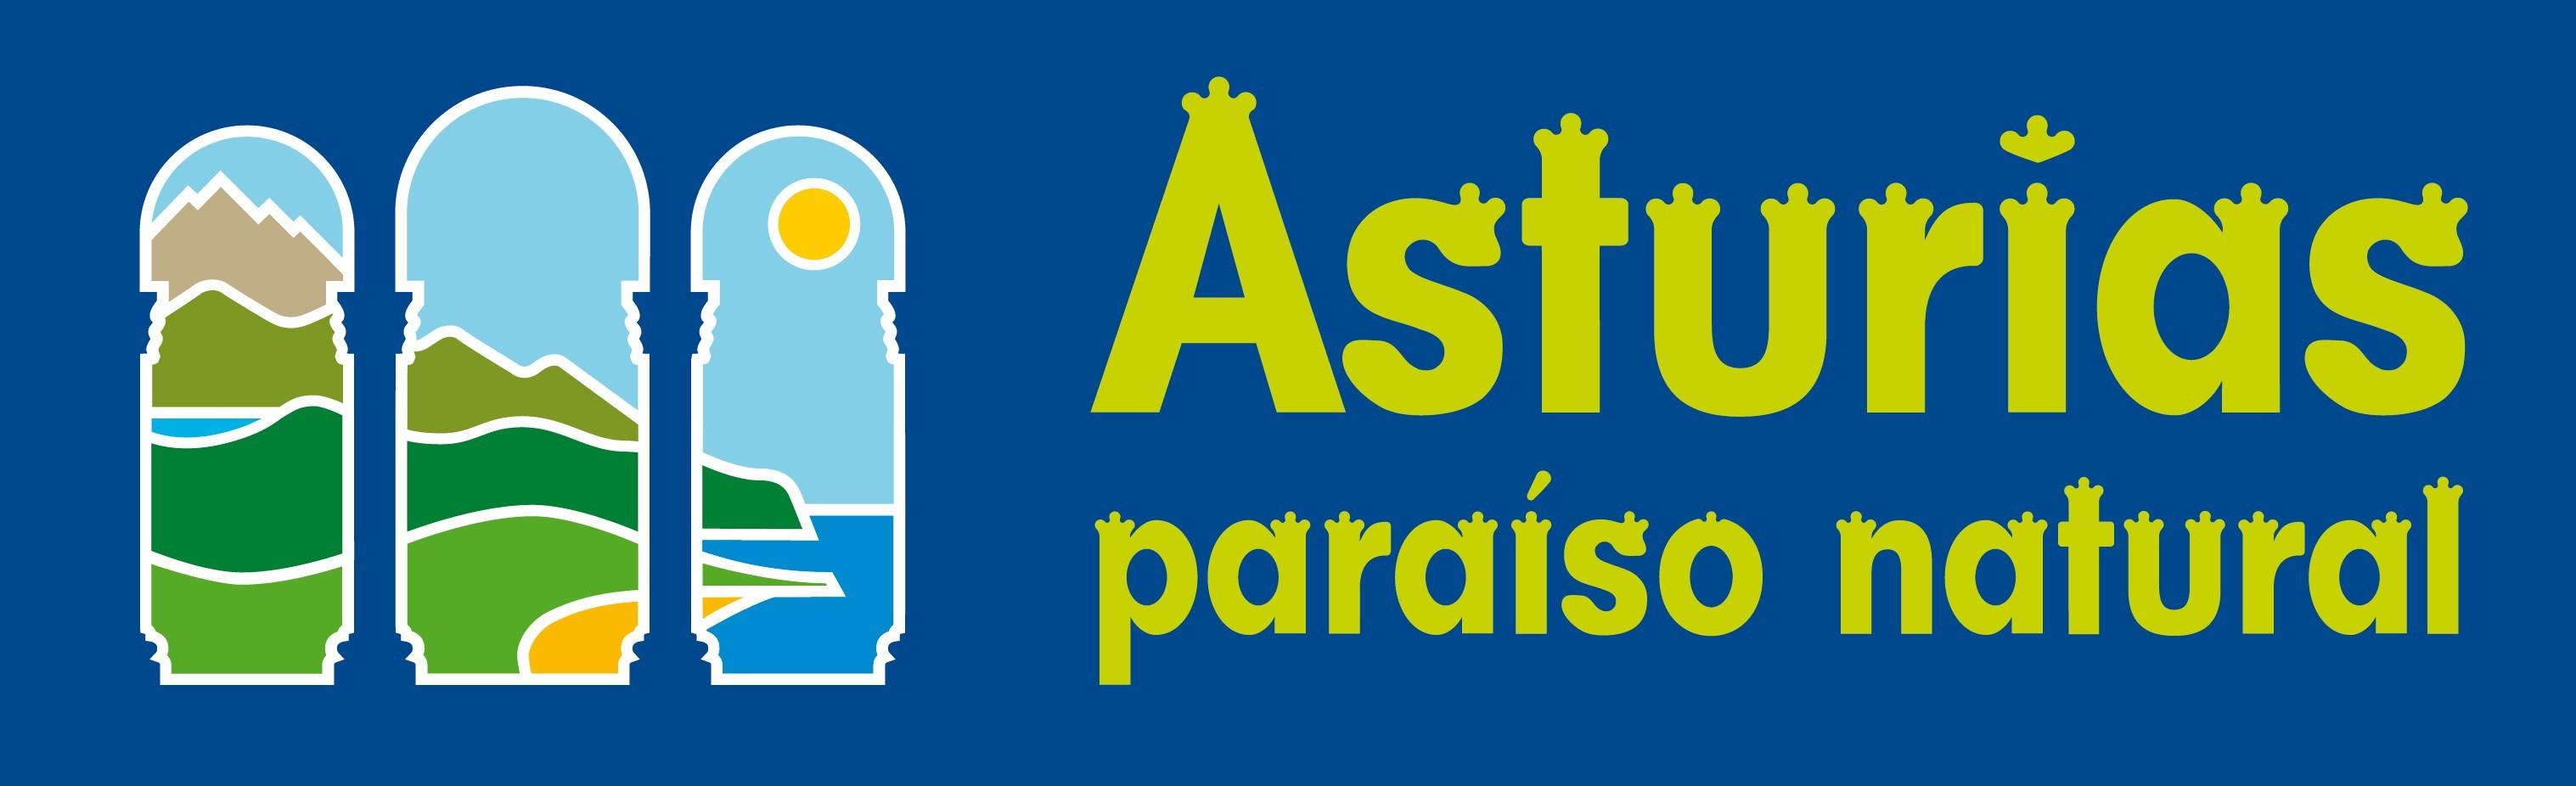 logo3.jpg Download STL file asturias • 3D printer object, RubenMenendezIglesias